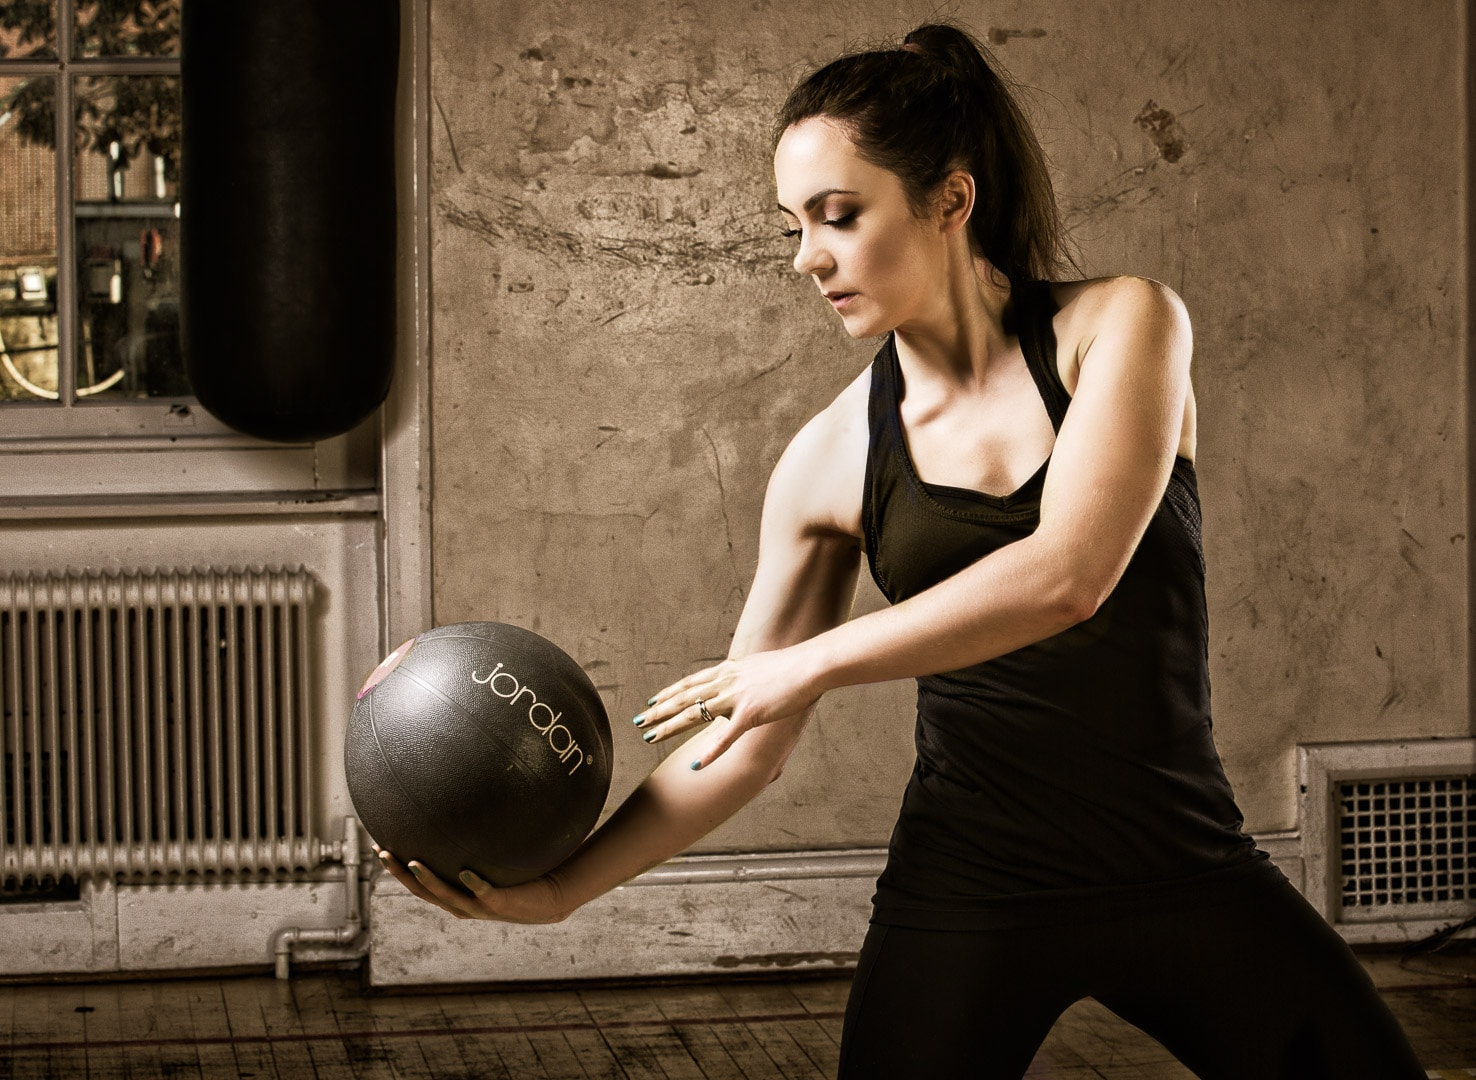 Fitness Photographer Fitness photography 'fitness photography' , 'fitness photographer' Sportrait